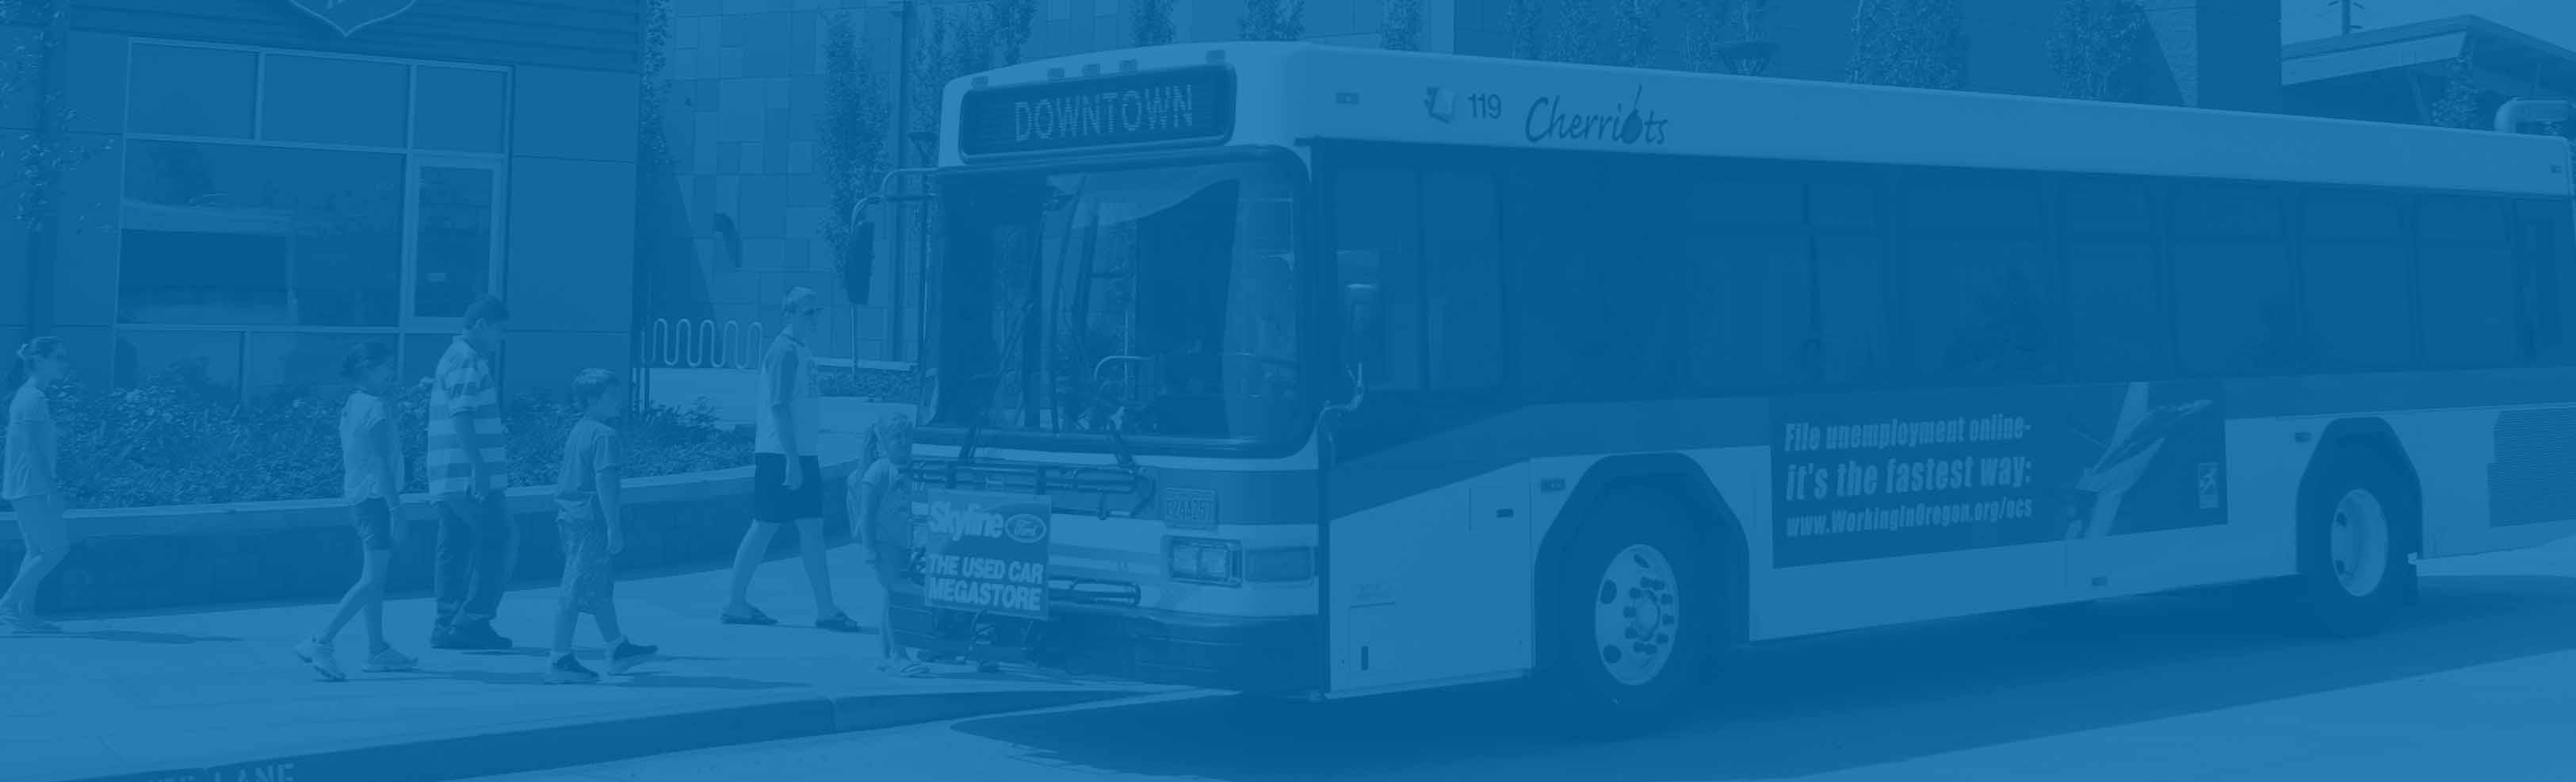 Cherriots Public Transit For The Salem Or Region